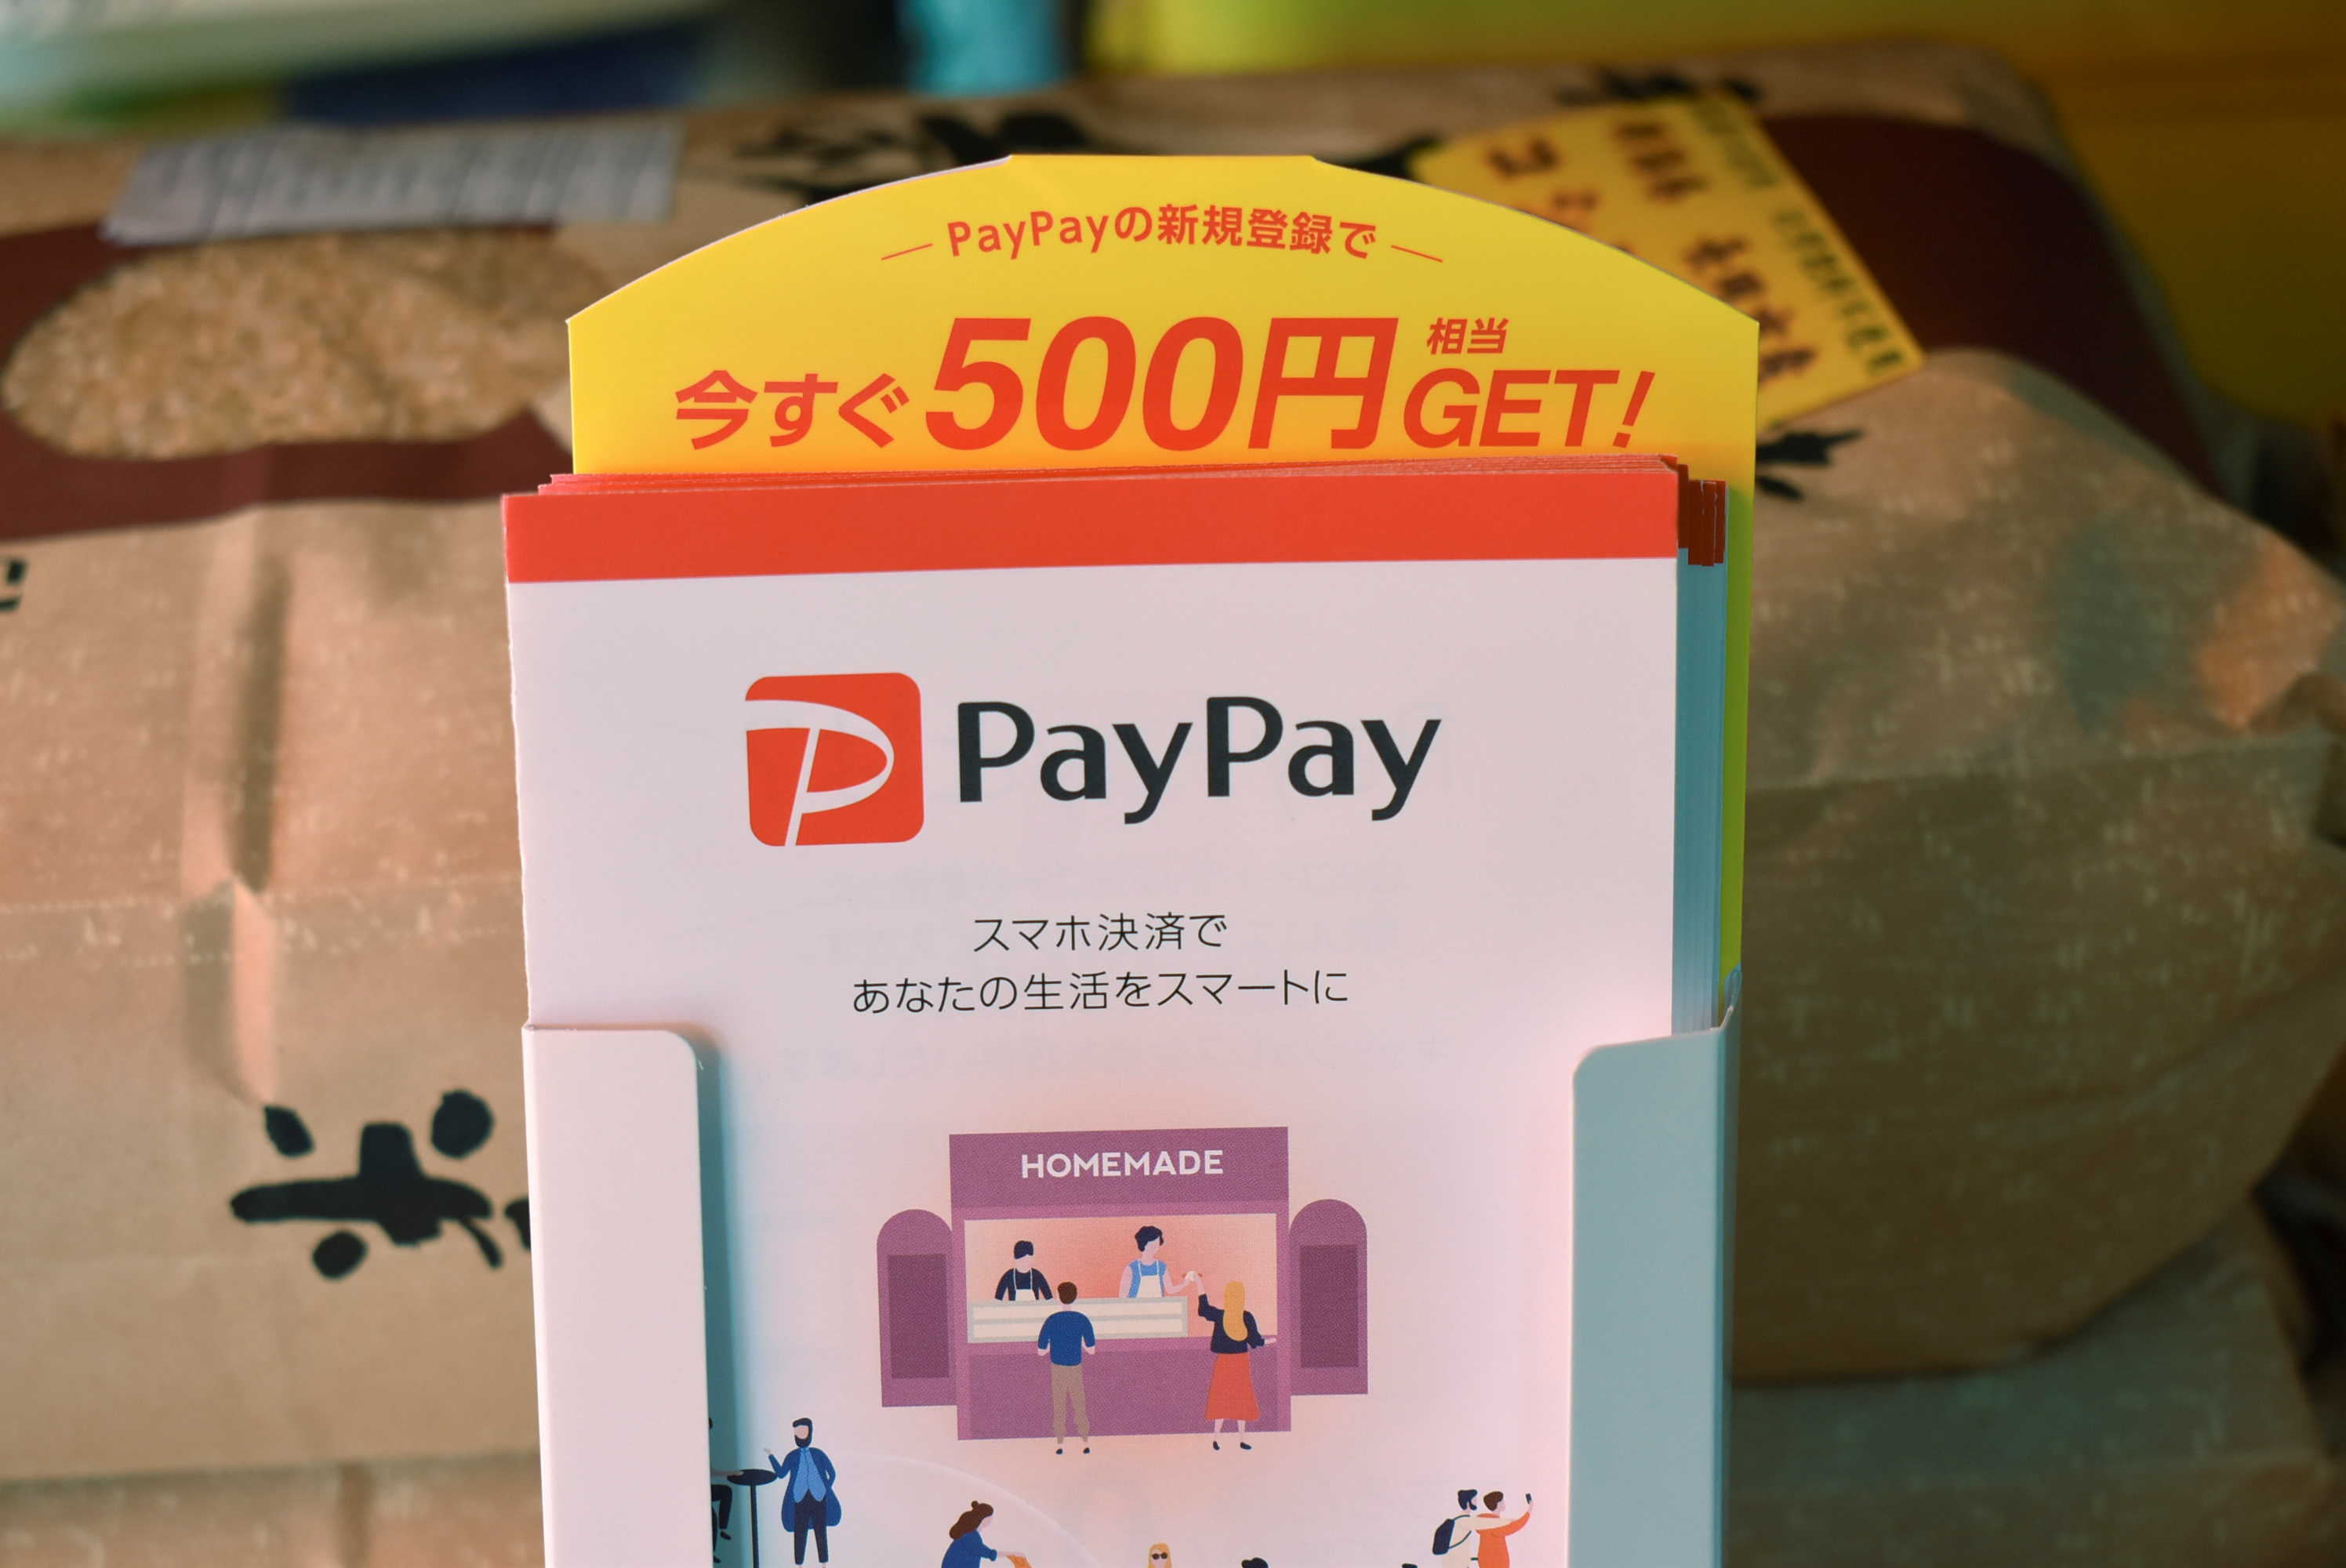 PayPay app leaflets are displayed at the rice dealer's shop Mikawaya, in Tokyo, Japan June 7, 2021. Picture taken June 7, 2021. REUTERS/Sam Nussey